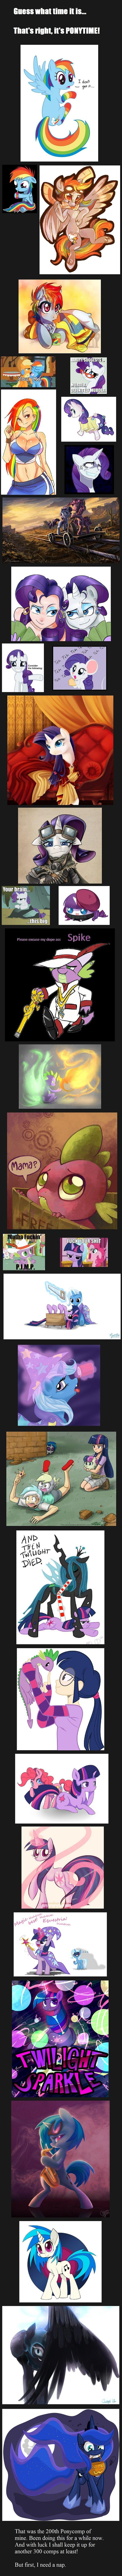 Ponycomp 200. Ponycomp 199: /channel/ponytime/Ponycomp+199/aXmhGnK/ DOWNLOAD LINK: docs.google.com/folder/d/0B4SOCzXHPRD..... Sleep, you deserve it. My Little Pony ponies ponytime